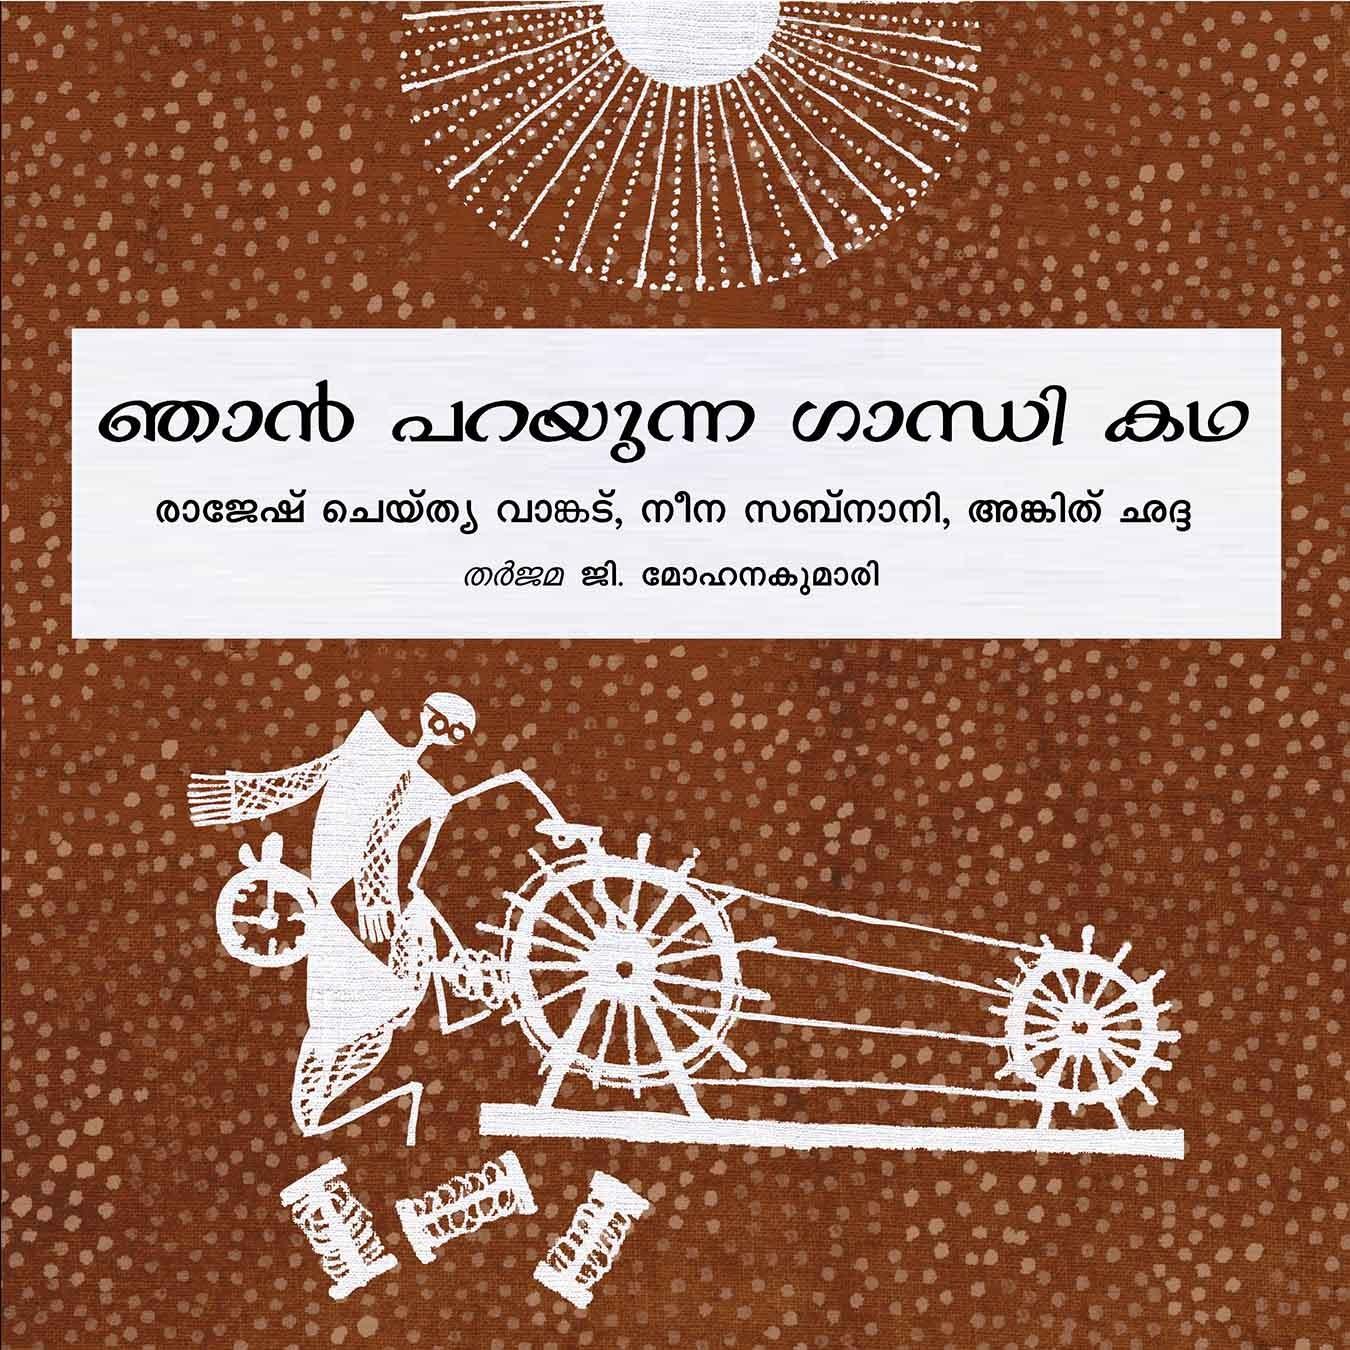 My Gandhi Story/Nyaan Parayunna Gandhi Kadha (Malayalam)